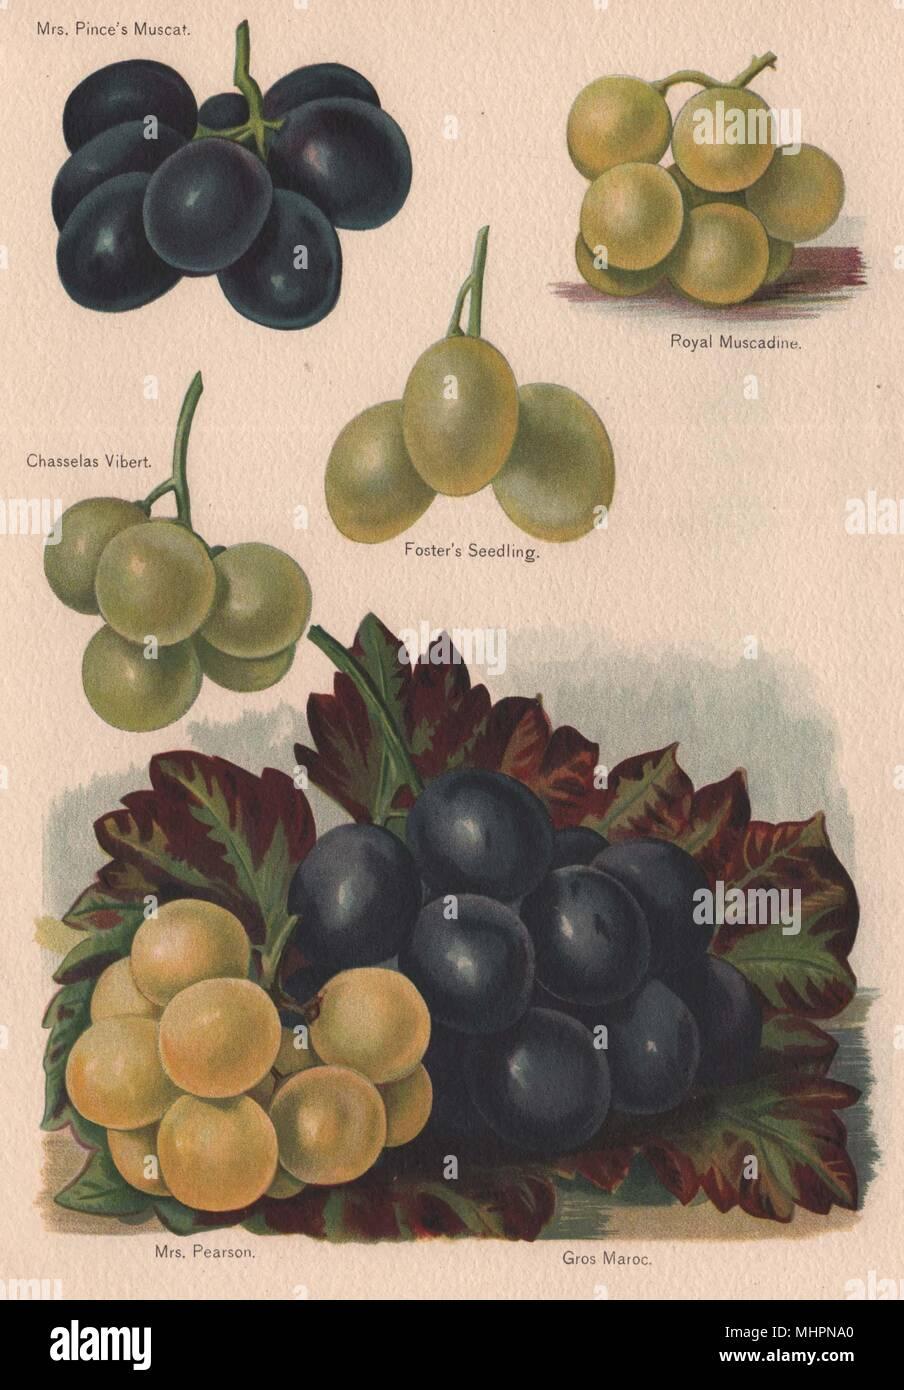 GRAPES. Mrs. Pince's Muscat; Royal Muscadine; Chasselas Vibert. WRIGHT 1892 Stock Photo